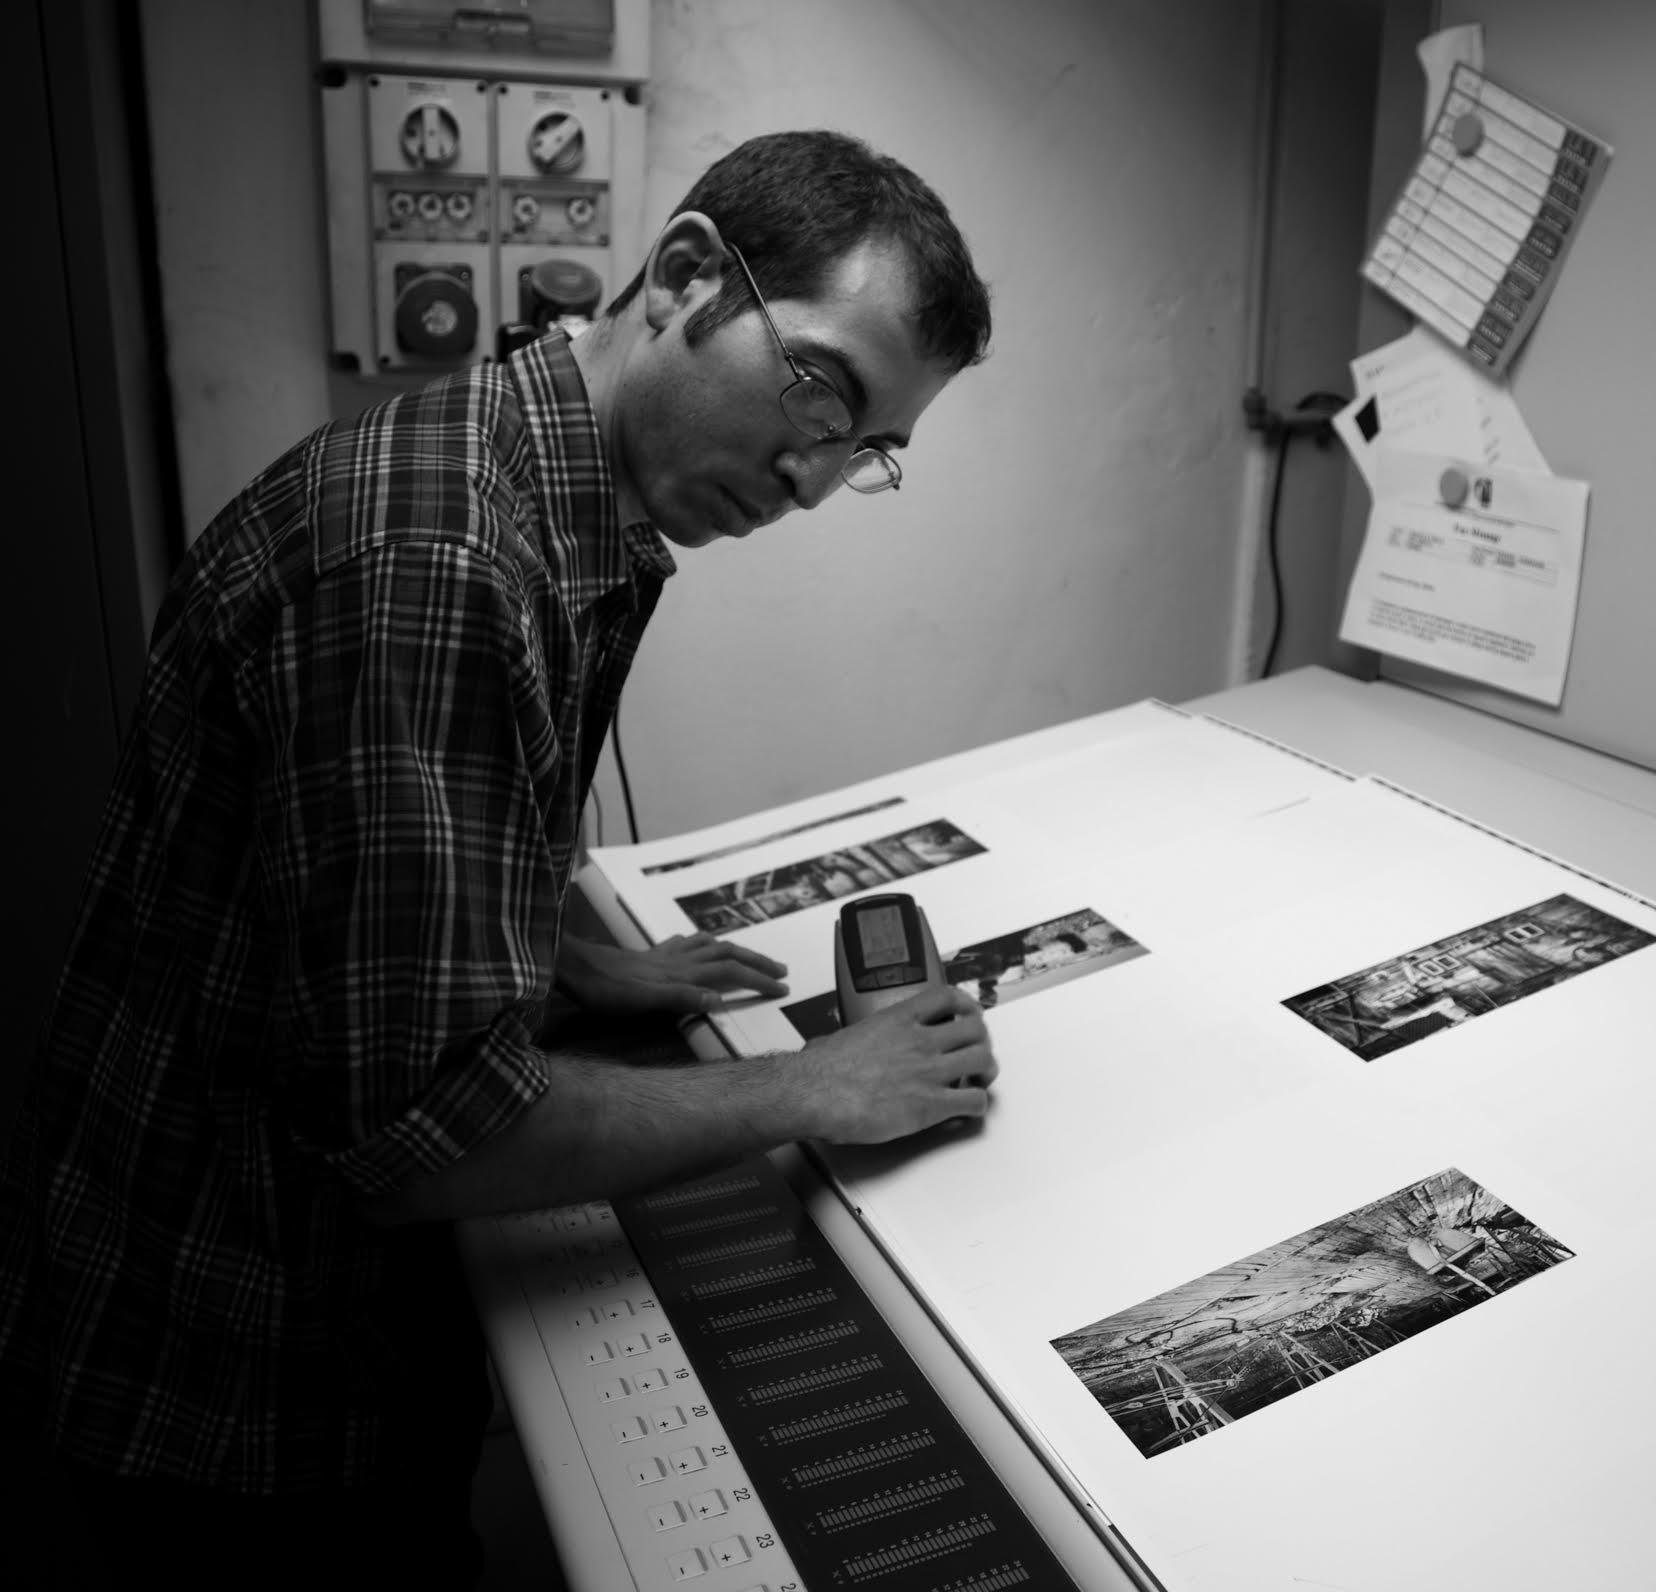 Daylight Books Photographic Storytelling Workshop, led by Michael Itkoff